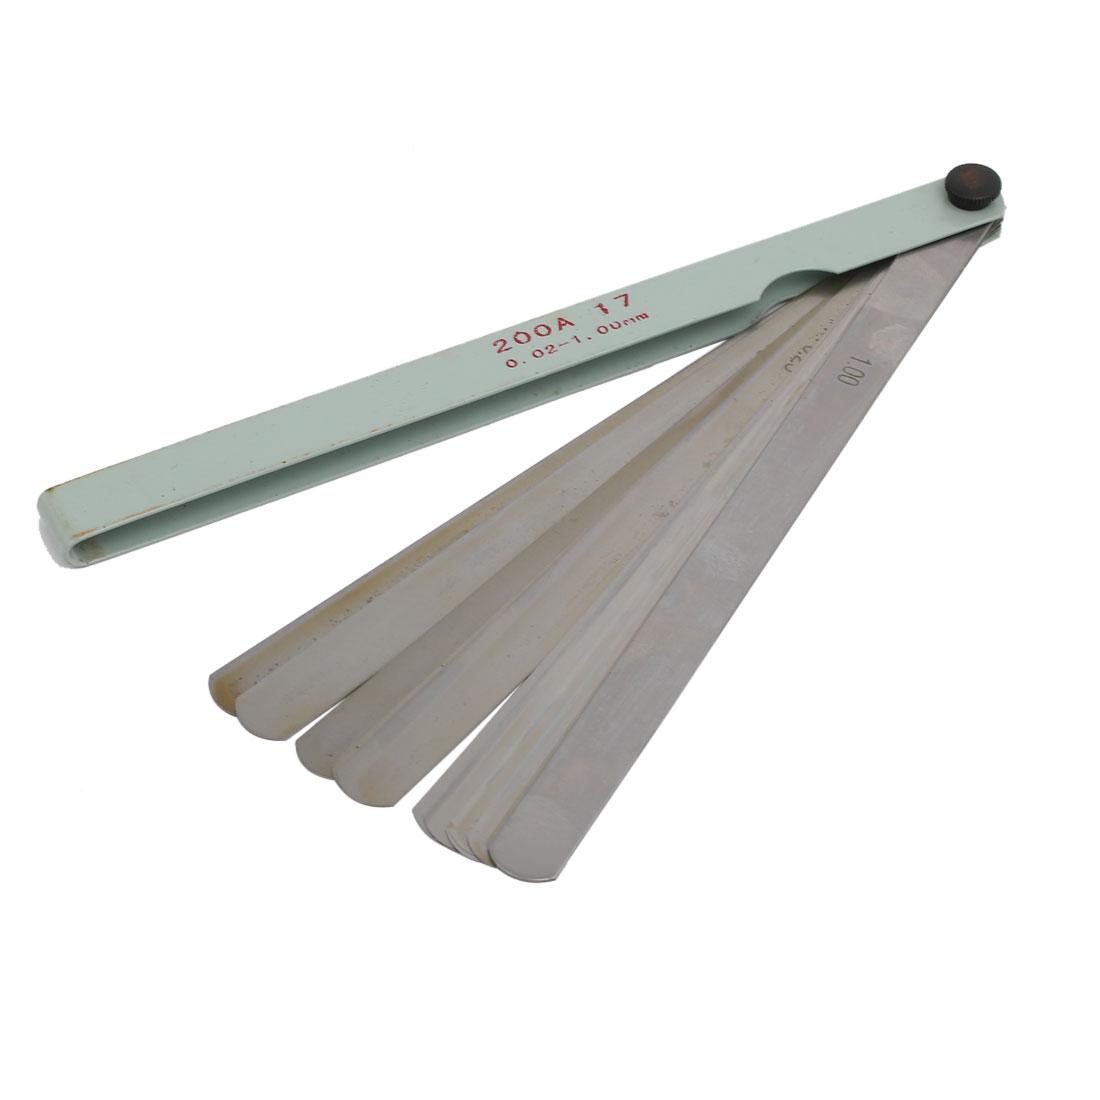 20.5cm Length 0.02-1.00mm Thickness Metal 17 Leave Measuring Tool Filler Gauge